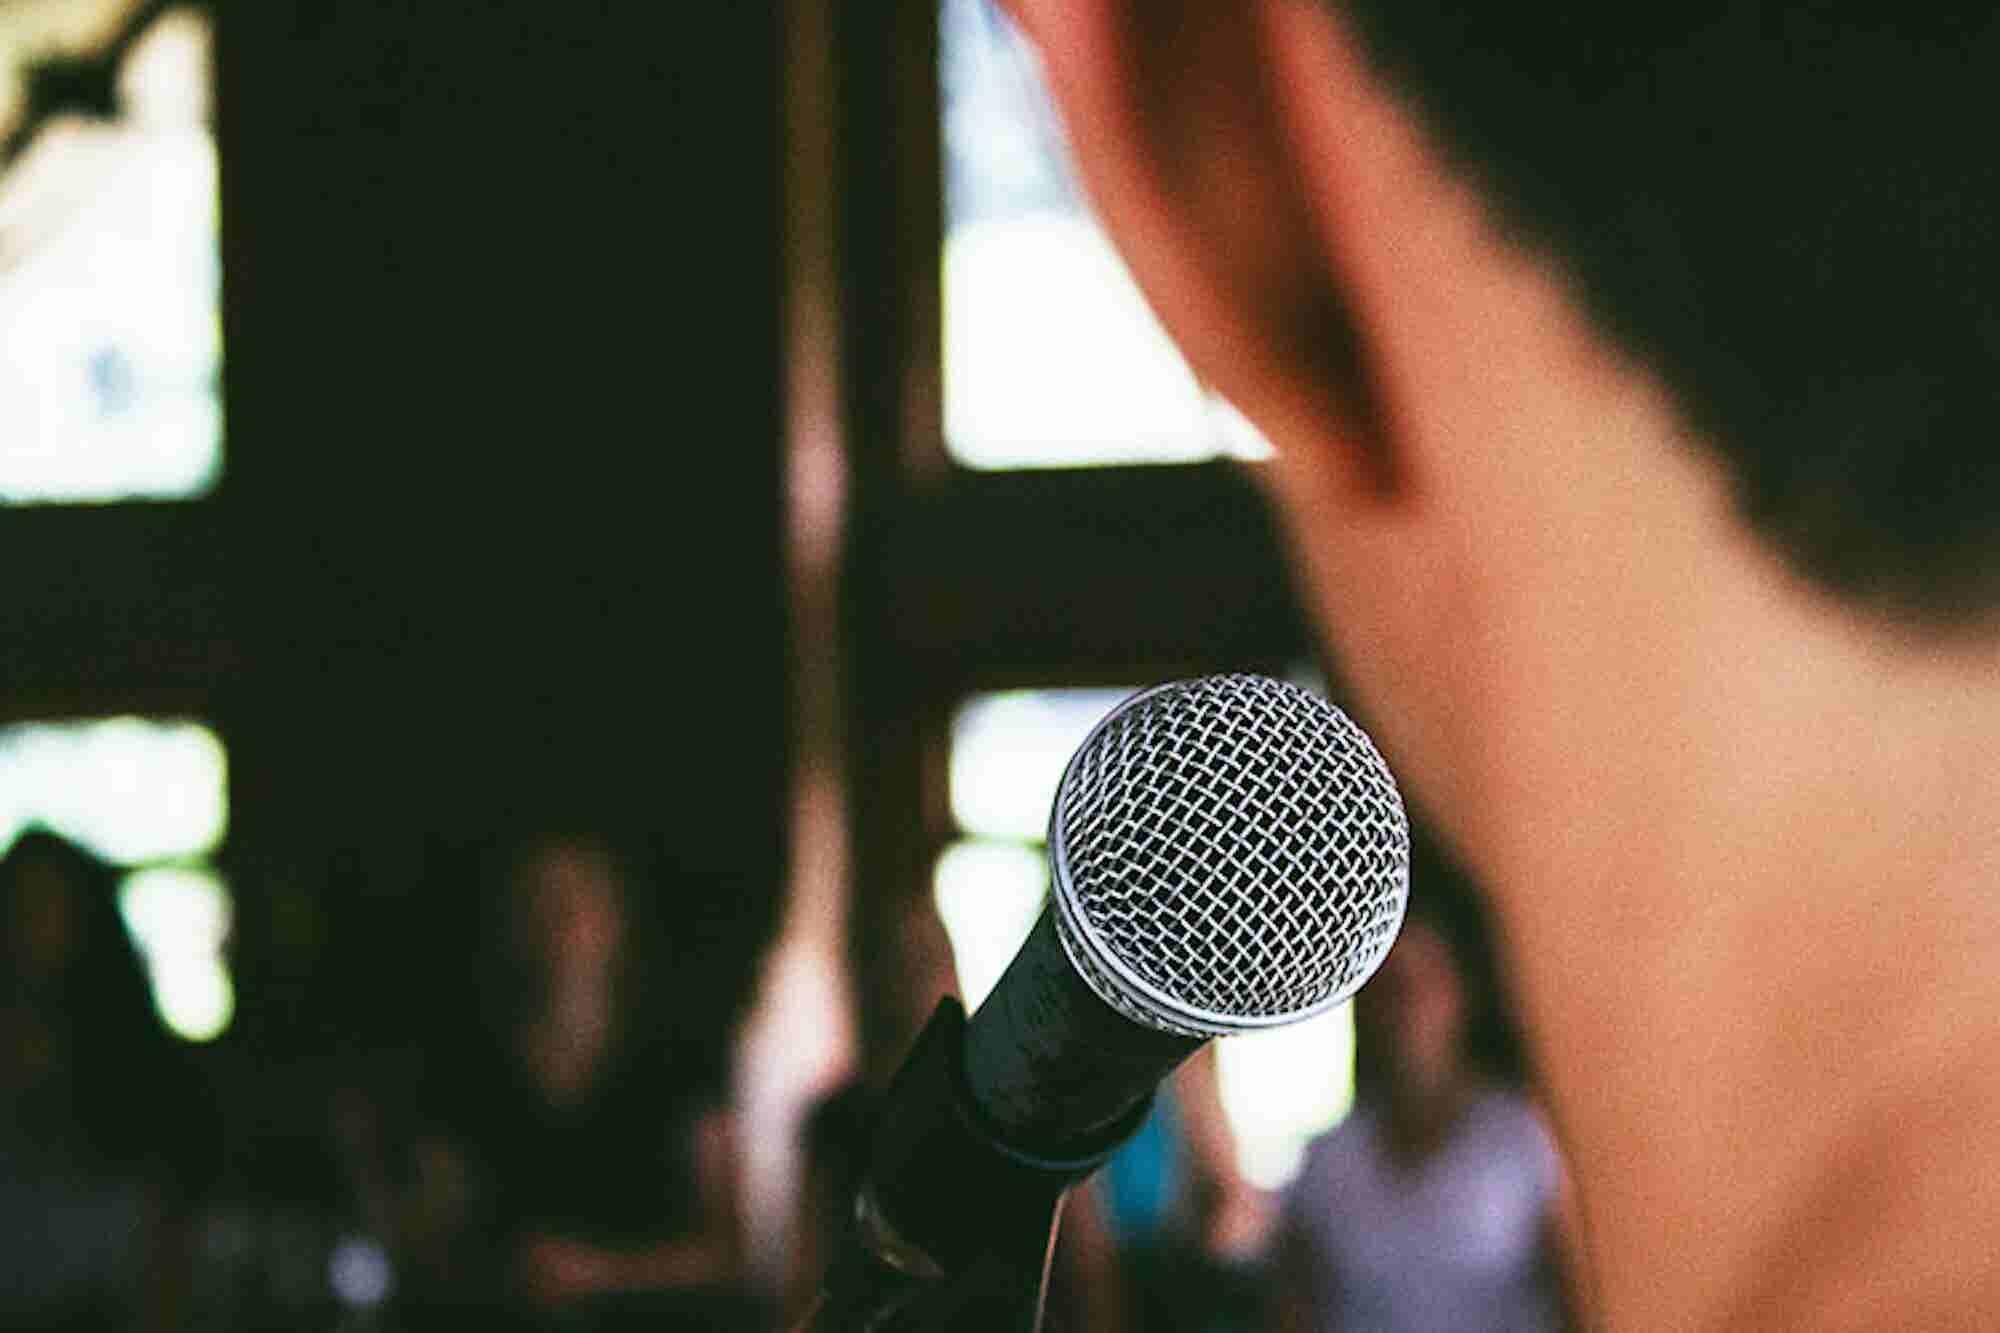 Warren Buffett Took a Public-Speaking Course, and So Should You